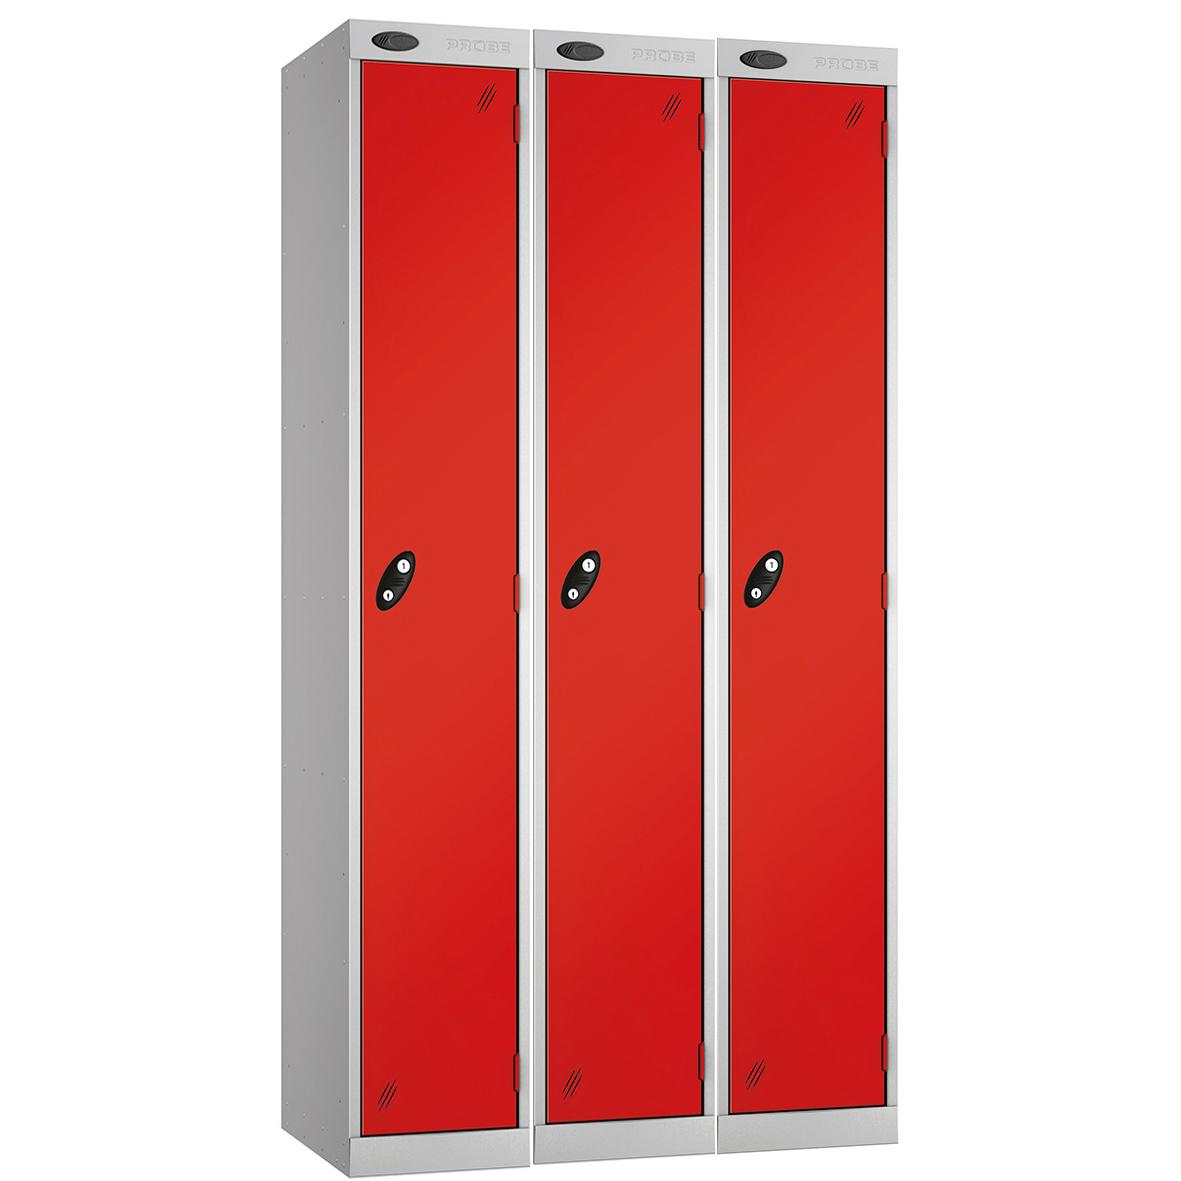 Probe Express Box Lockers - Nest 3 - 1 Tier Lockers